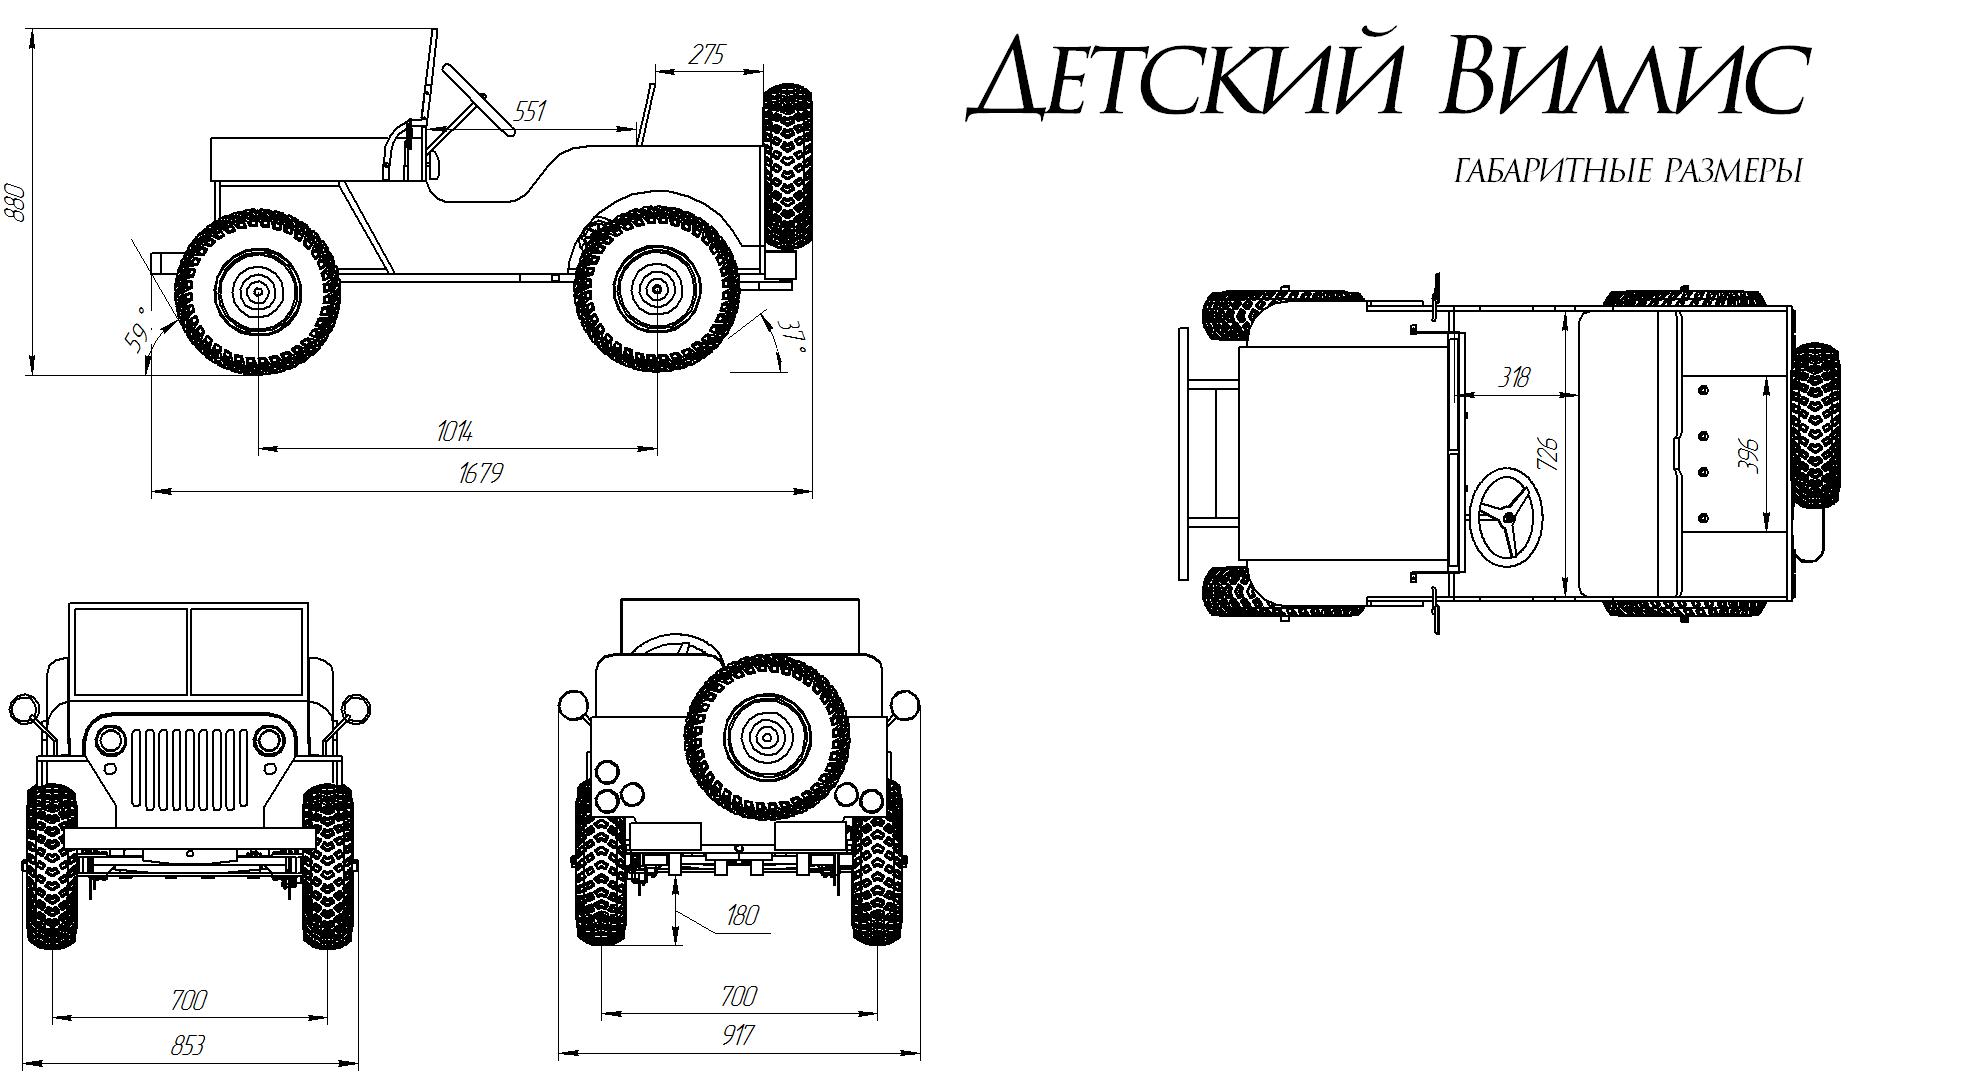 Indexphp 19661073 Go Kart Pinterest Mini Jeep And Cars Wrangler Draw Pedal